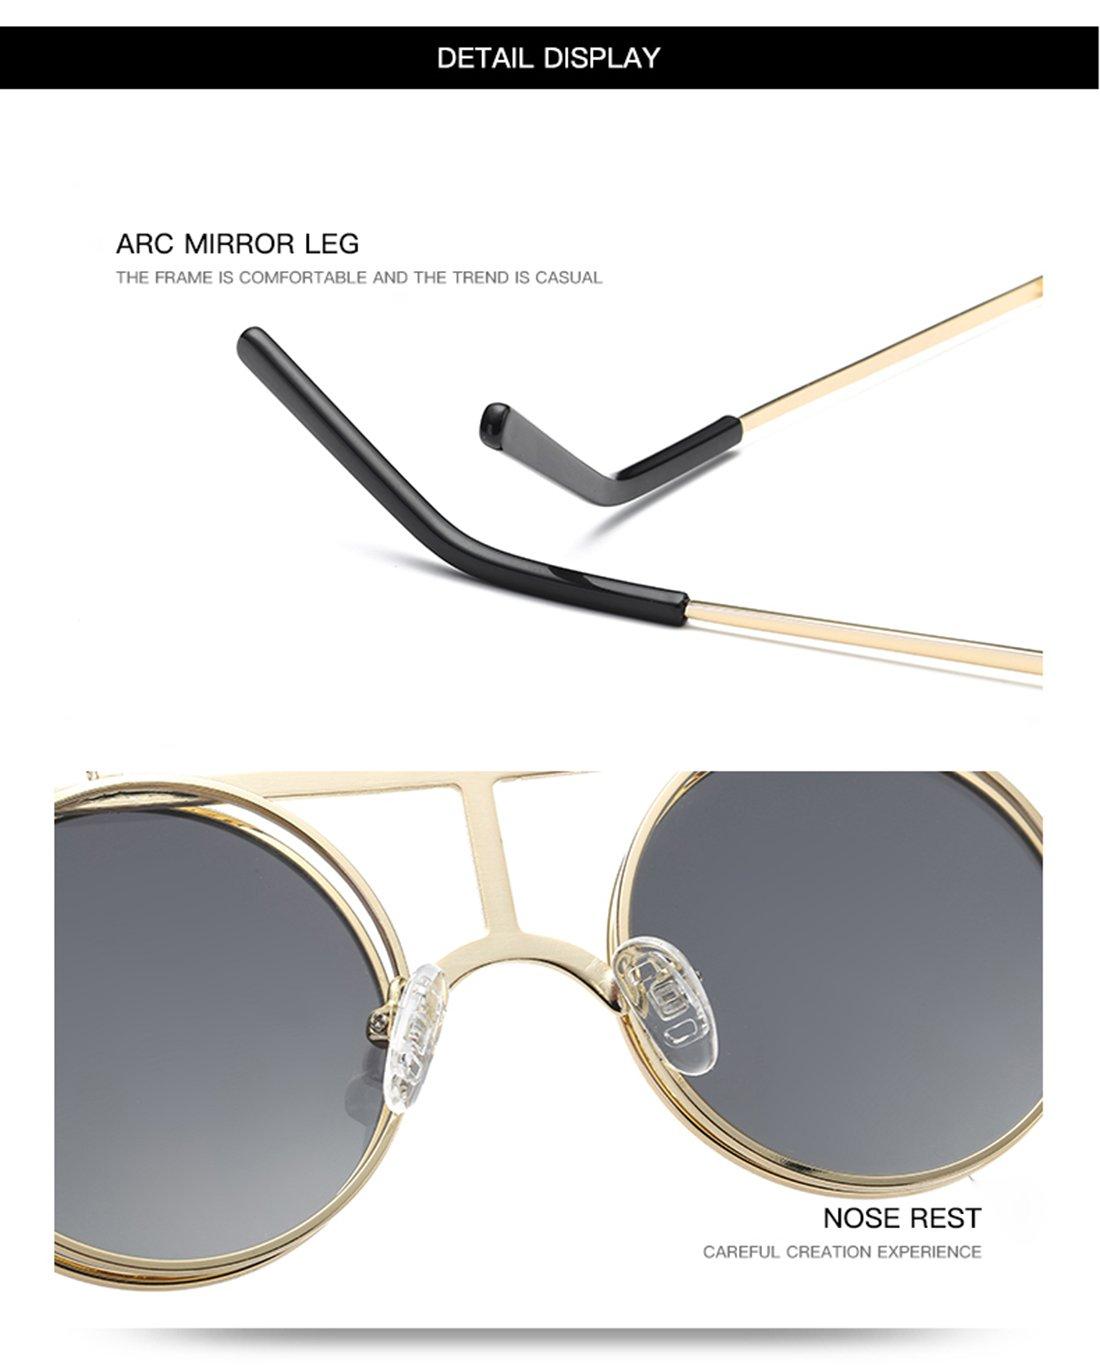 c28d9afe2e Joopin-Round Retro Polaroid Sunglasses Driving Polarized Glasses Men  Steampunk Simple packaging ) E4056